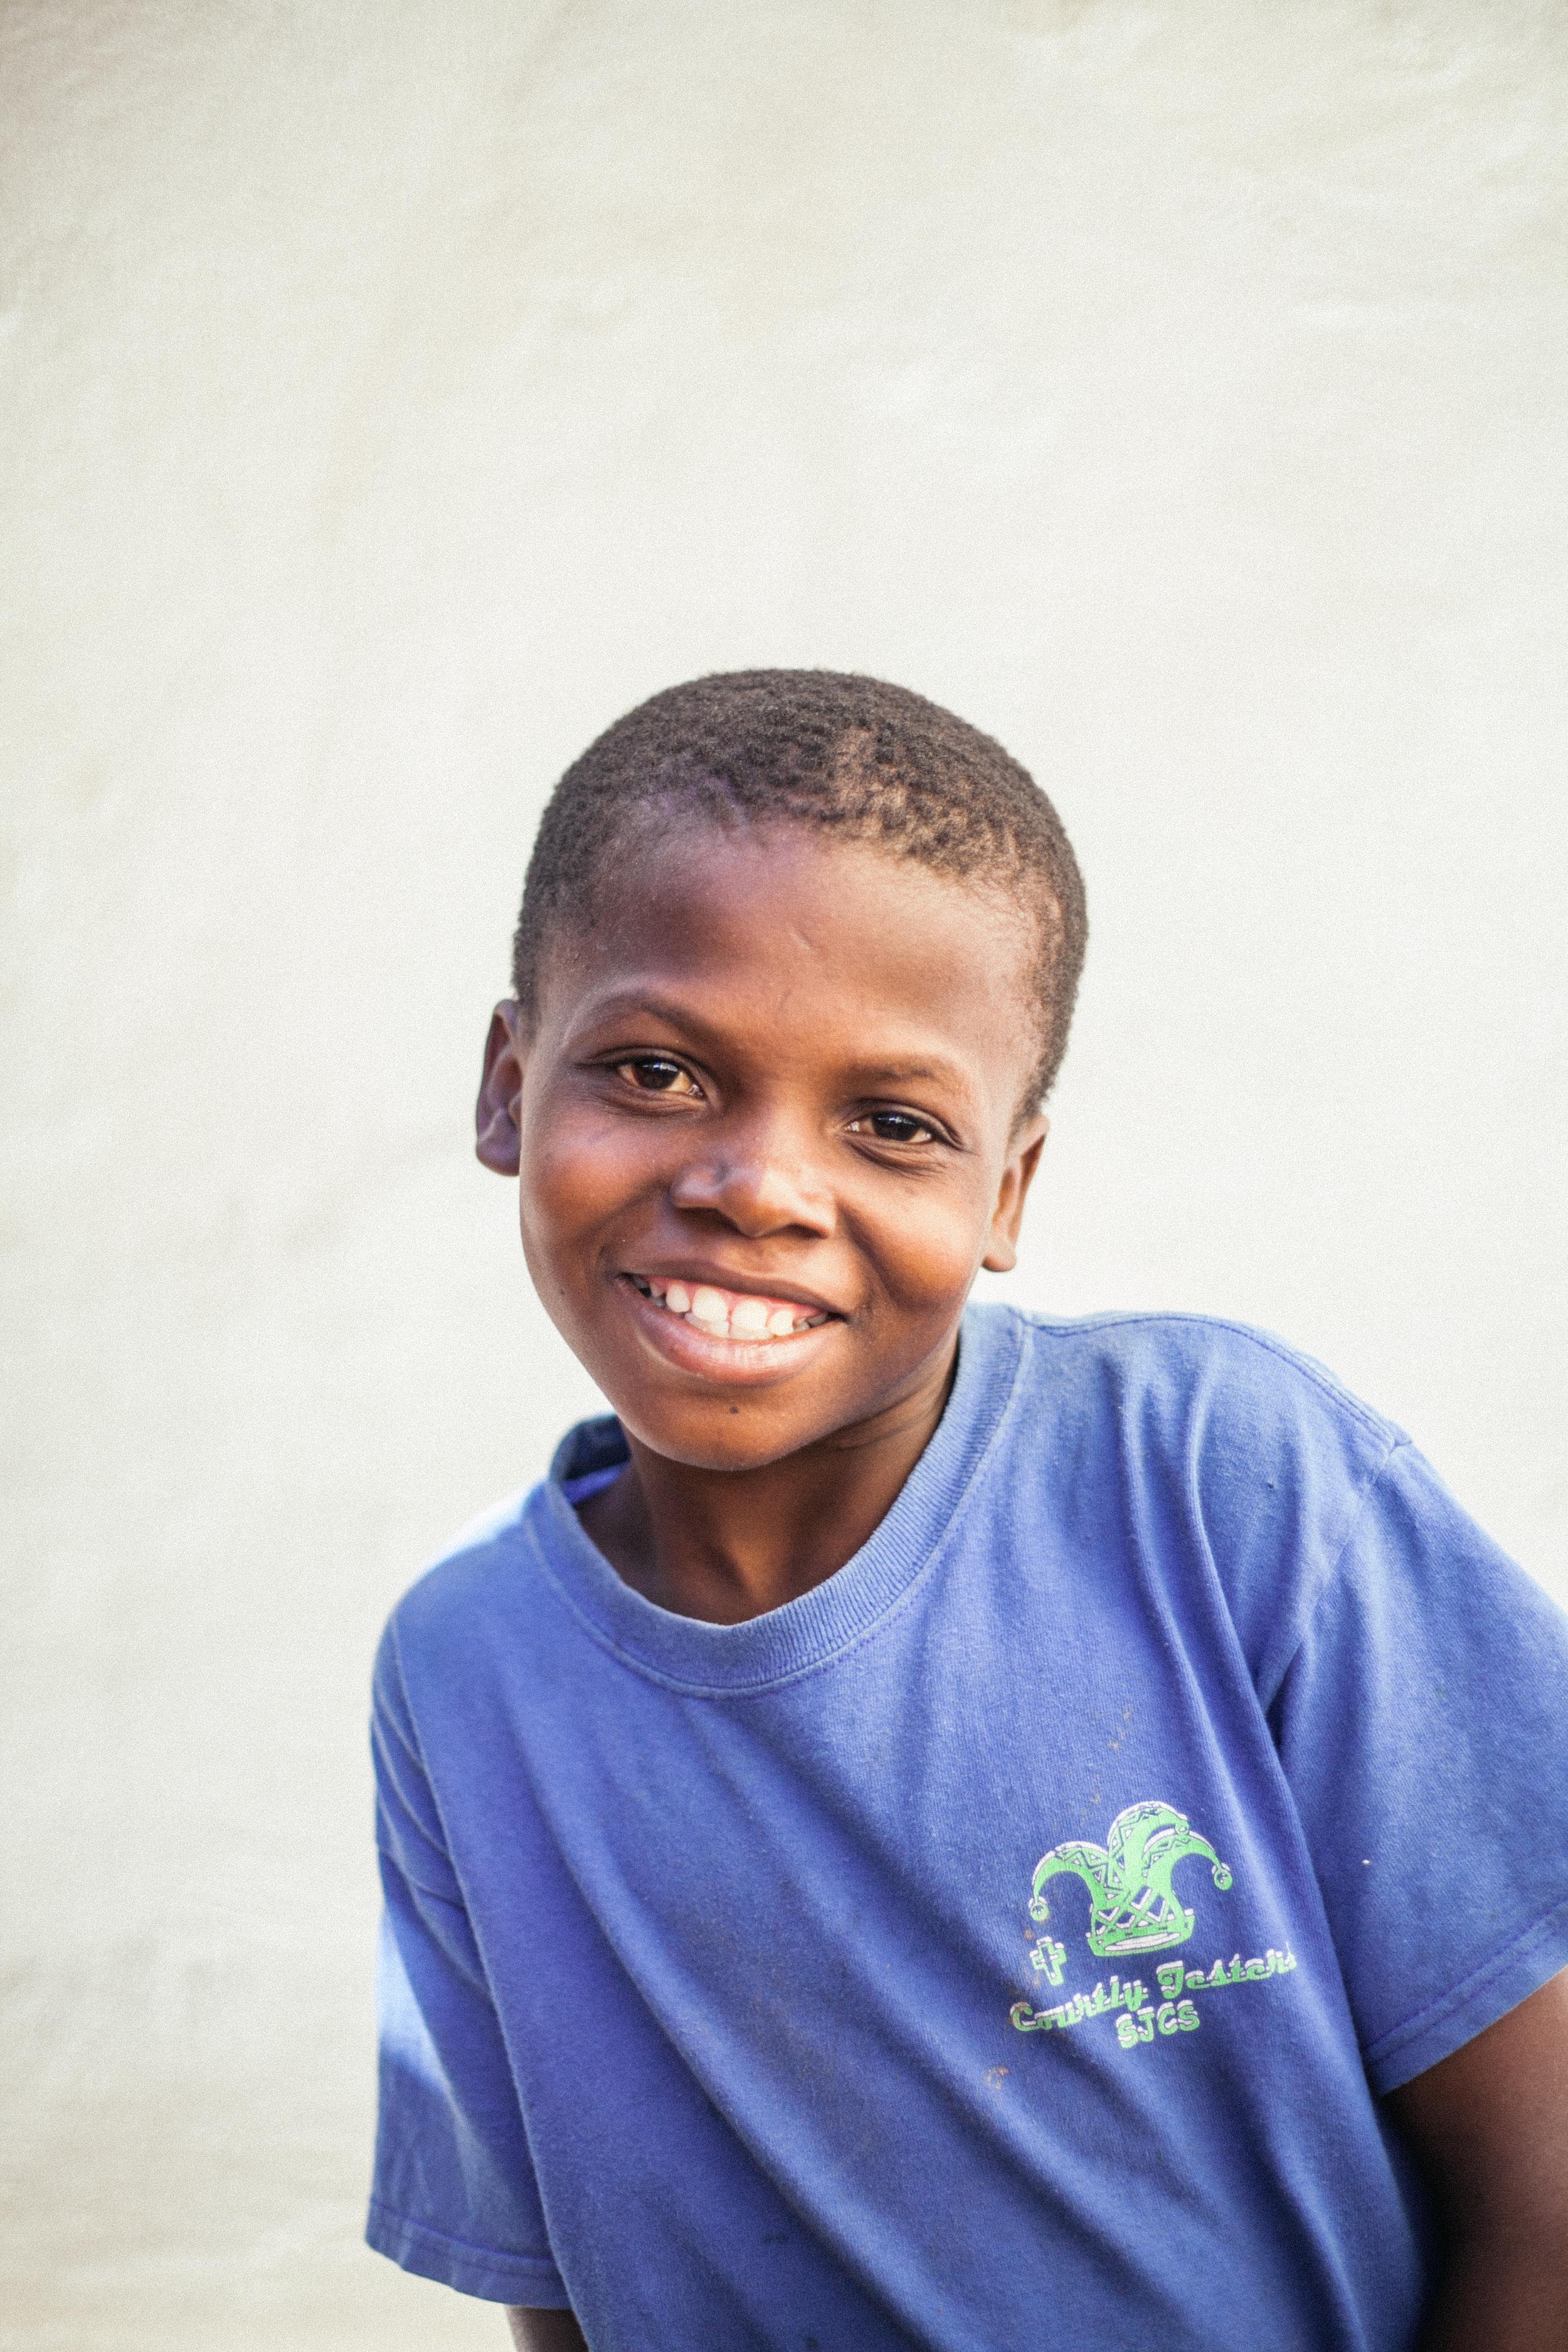 Haiti5starslores169.jpg